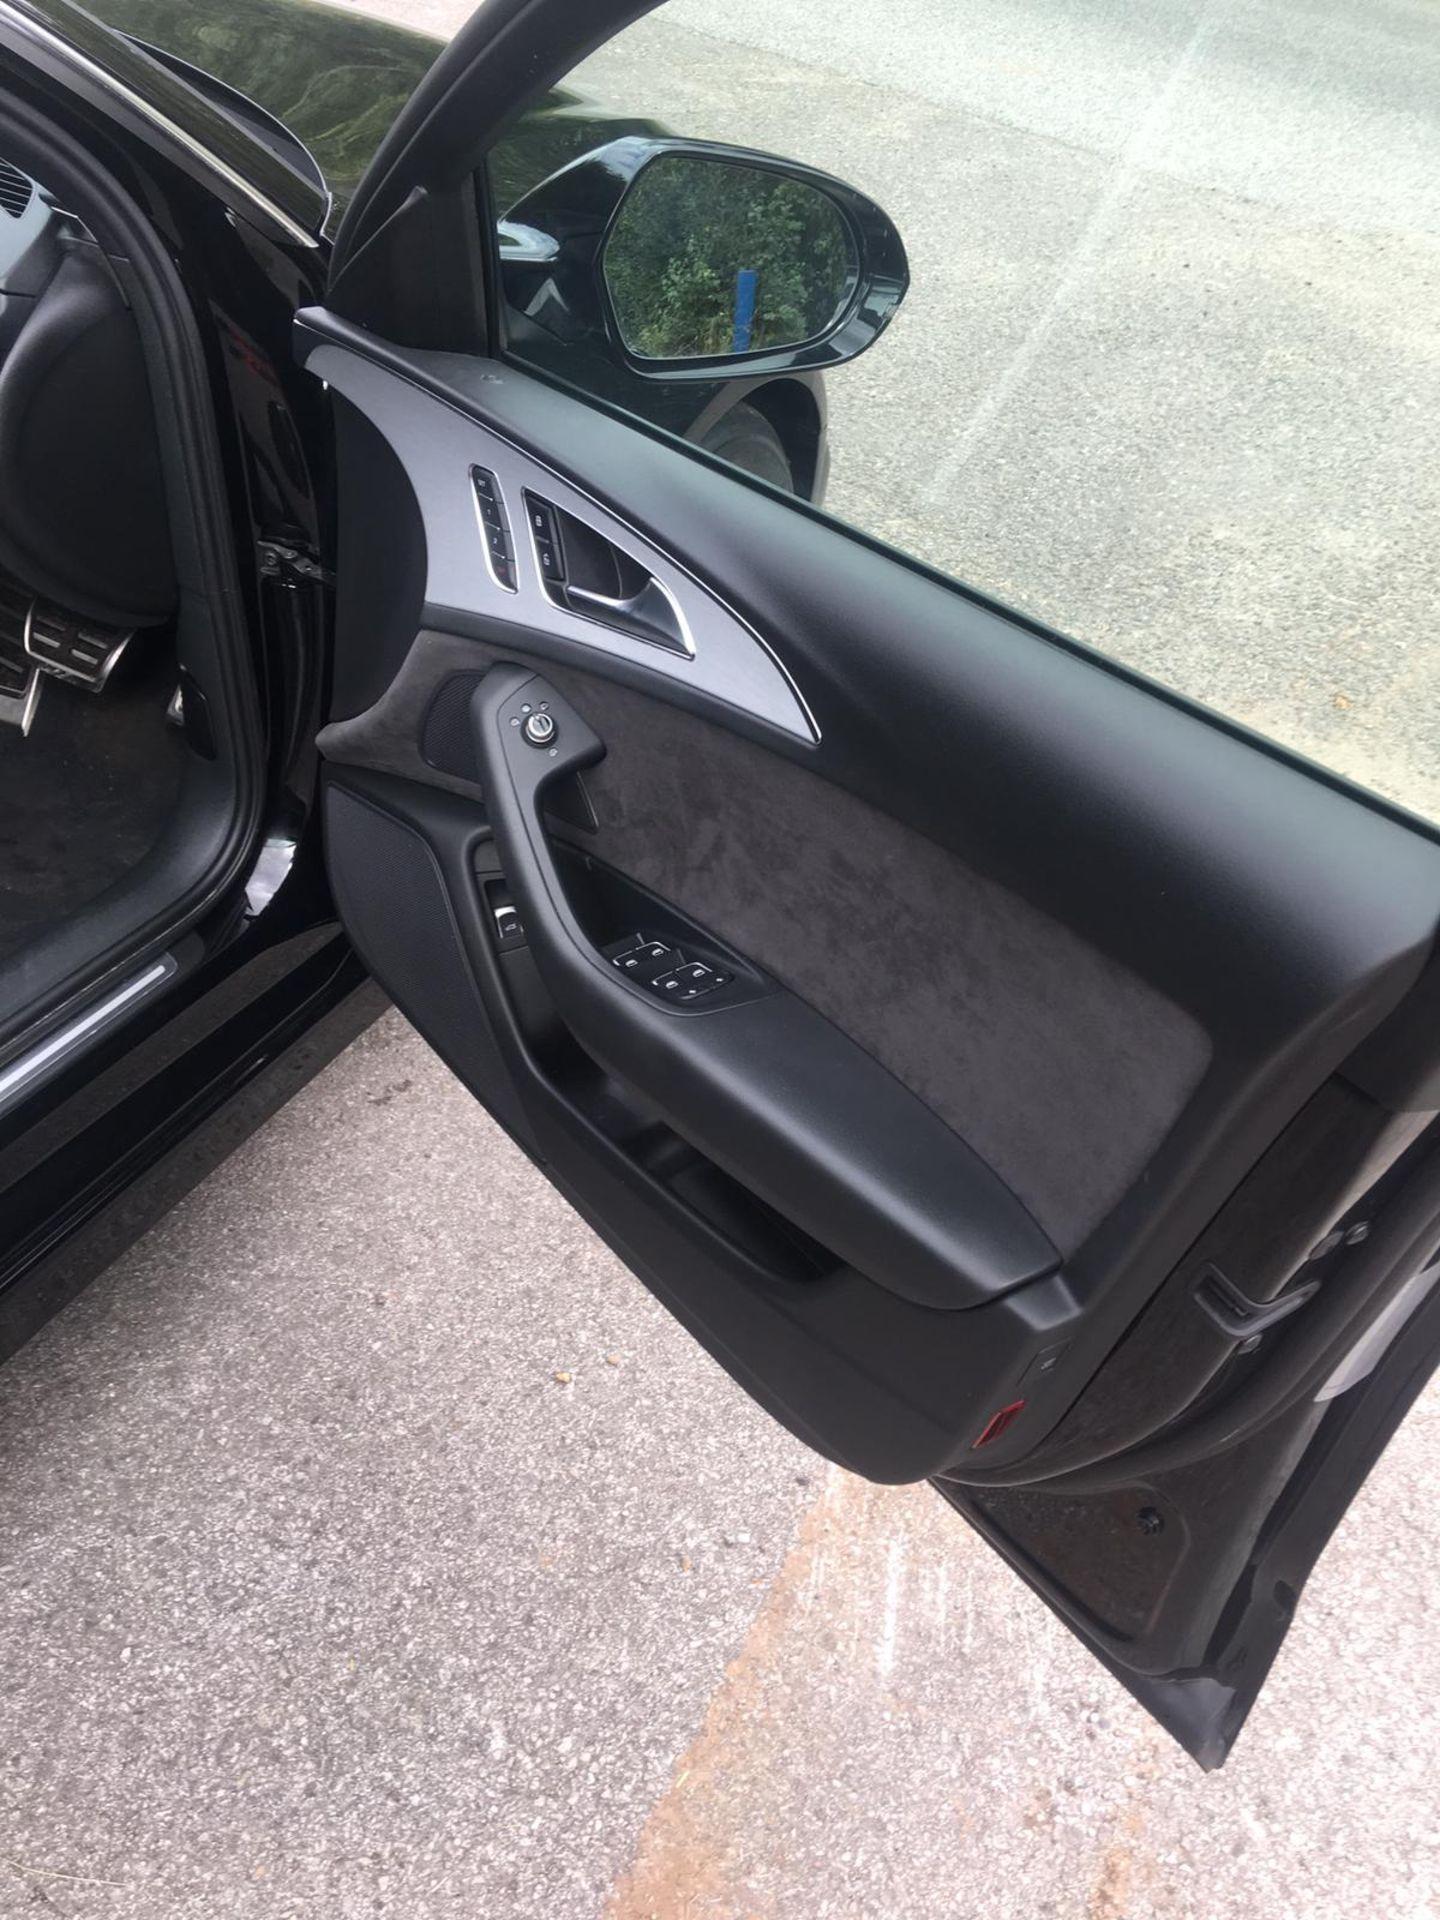 2018/18 REG AUDI A6 S LINE TDI ULTRA SEMI-AUTO 2.0 DIESEL ESTATE, SHOWING 1 FORMER KEEPER *NO VAT* - Image 18 of 33